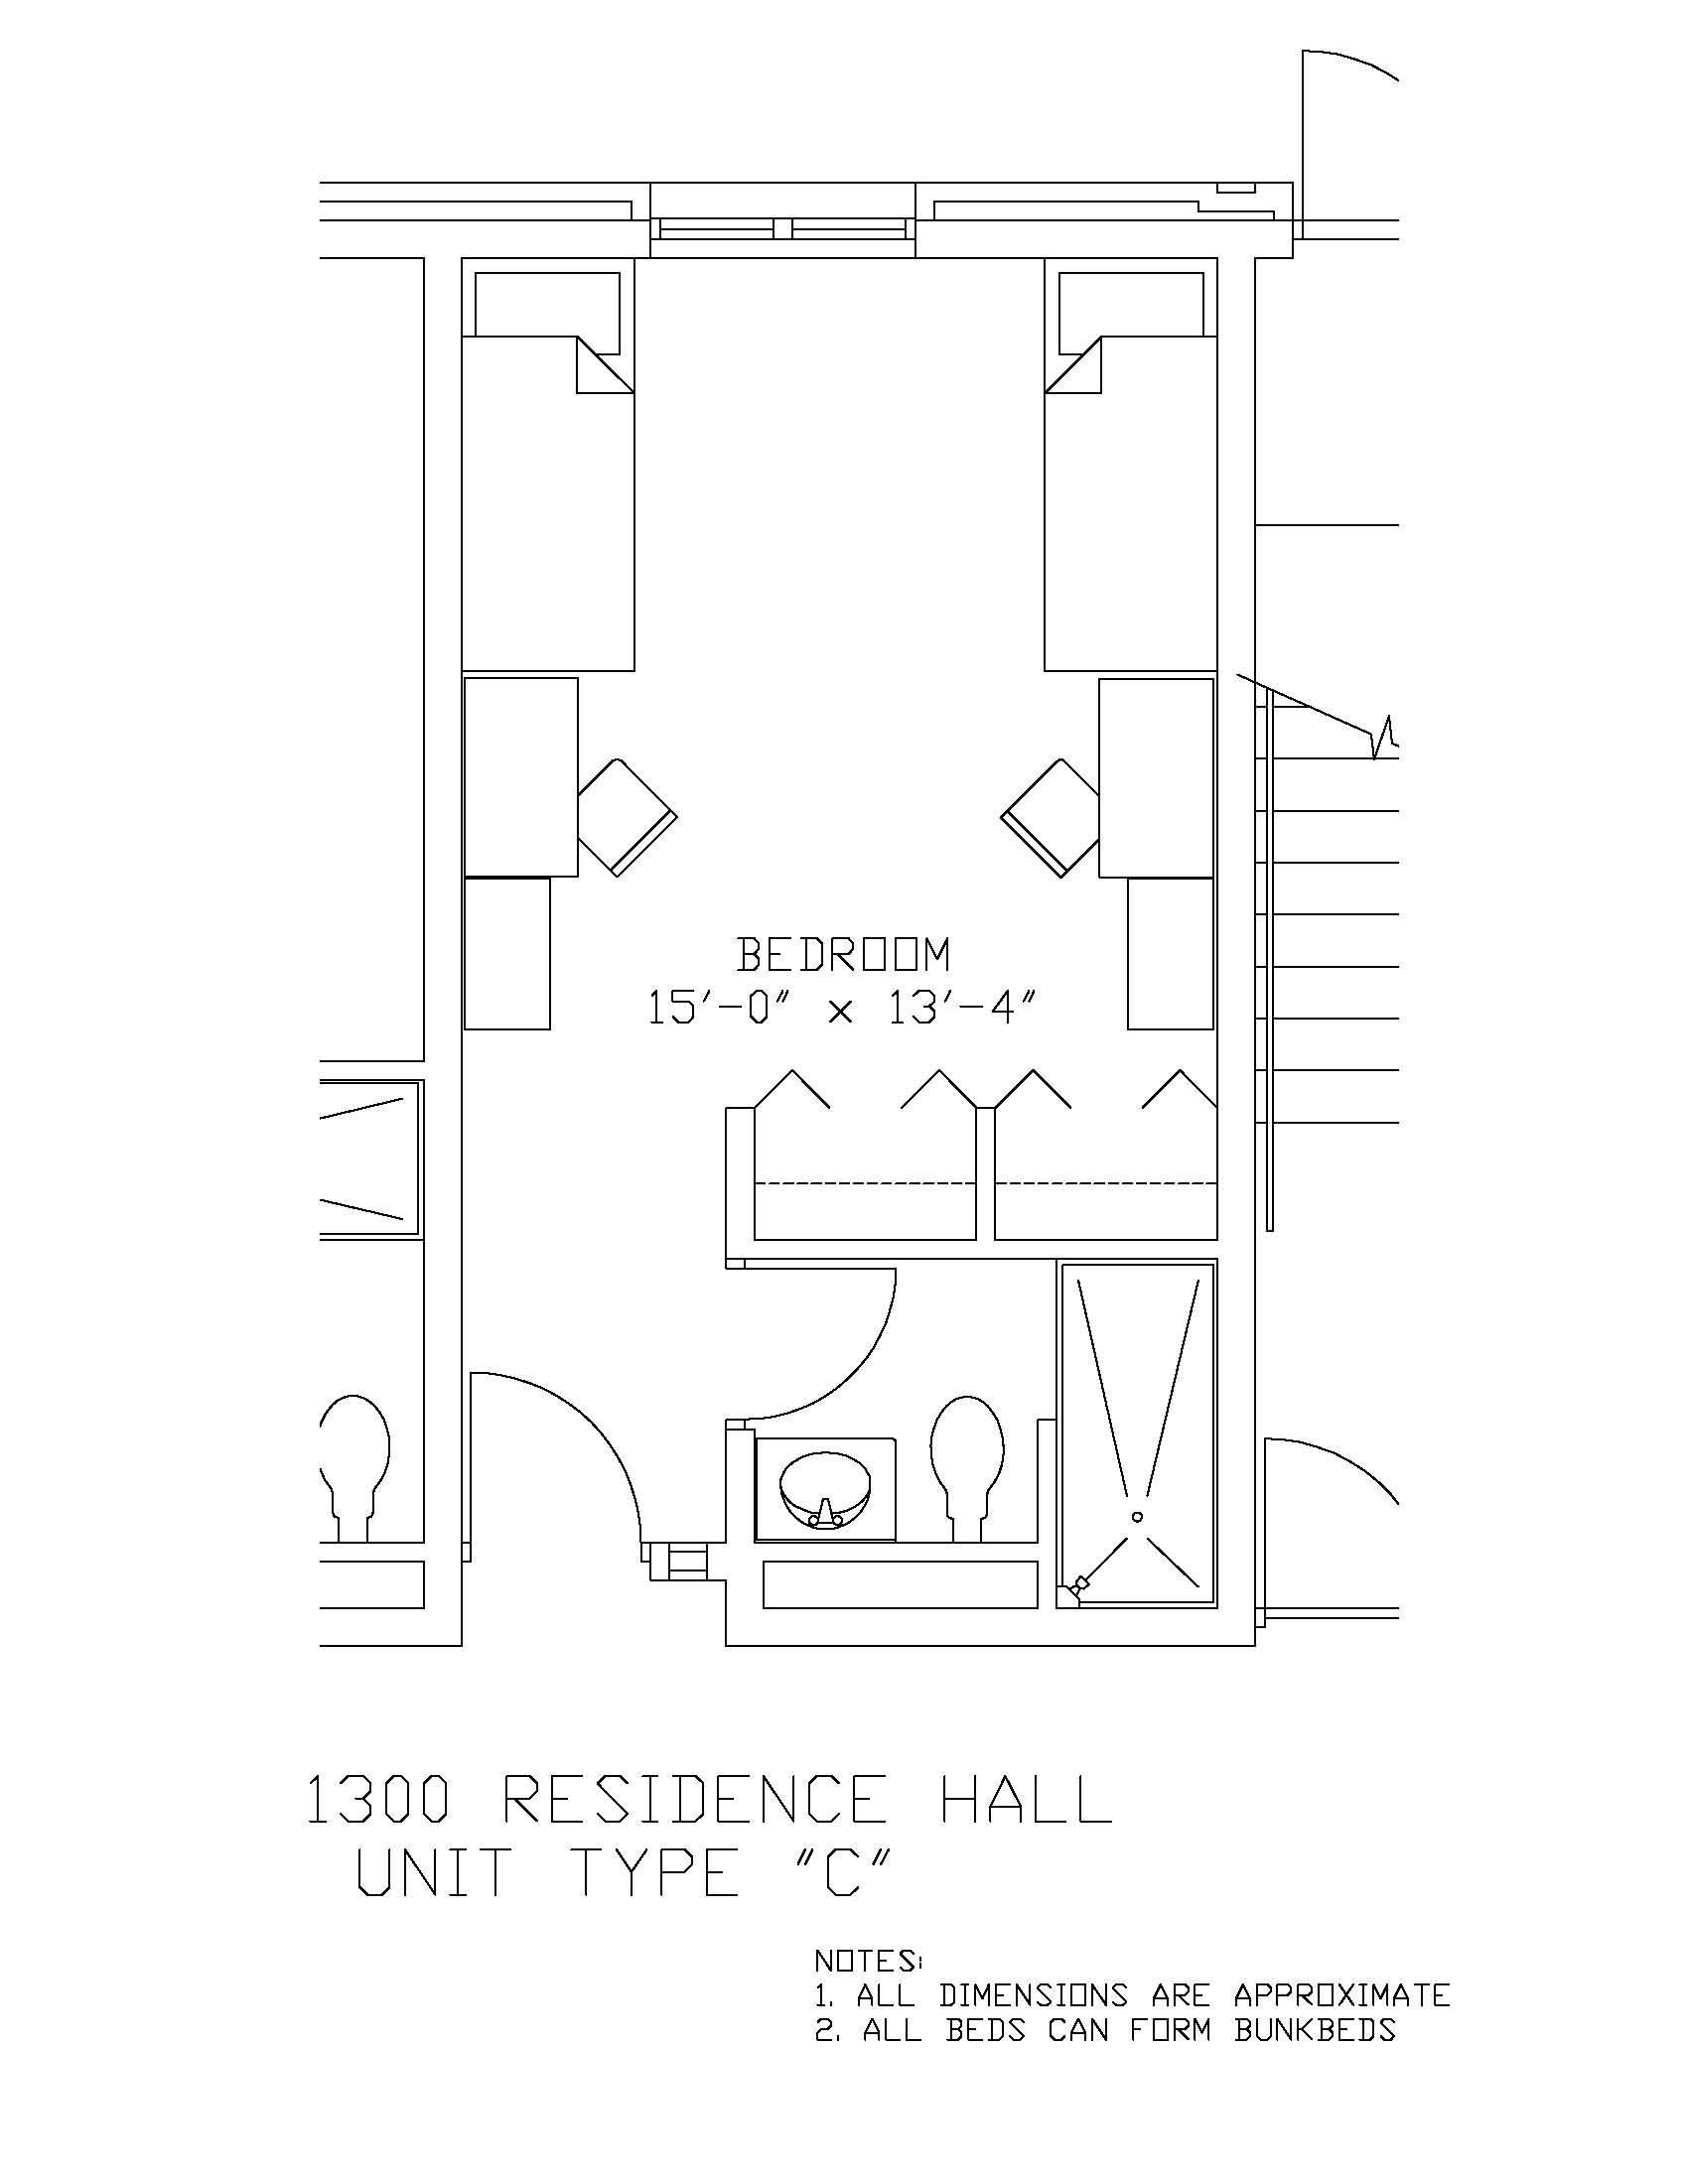 1300 Residence Hall: Type C